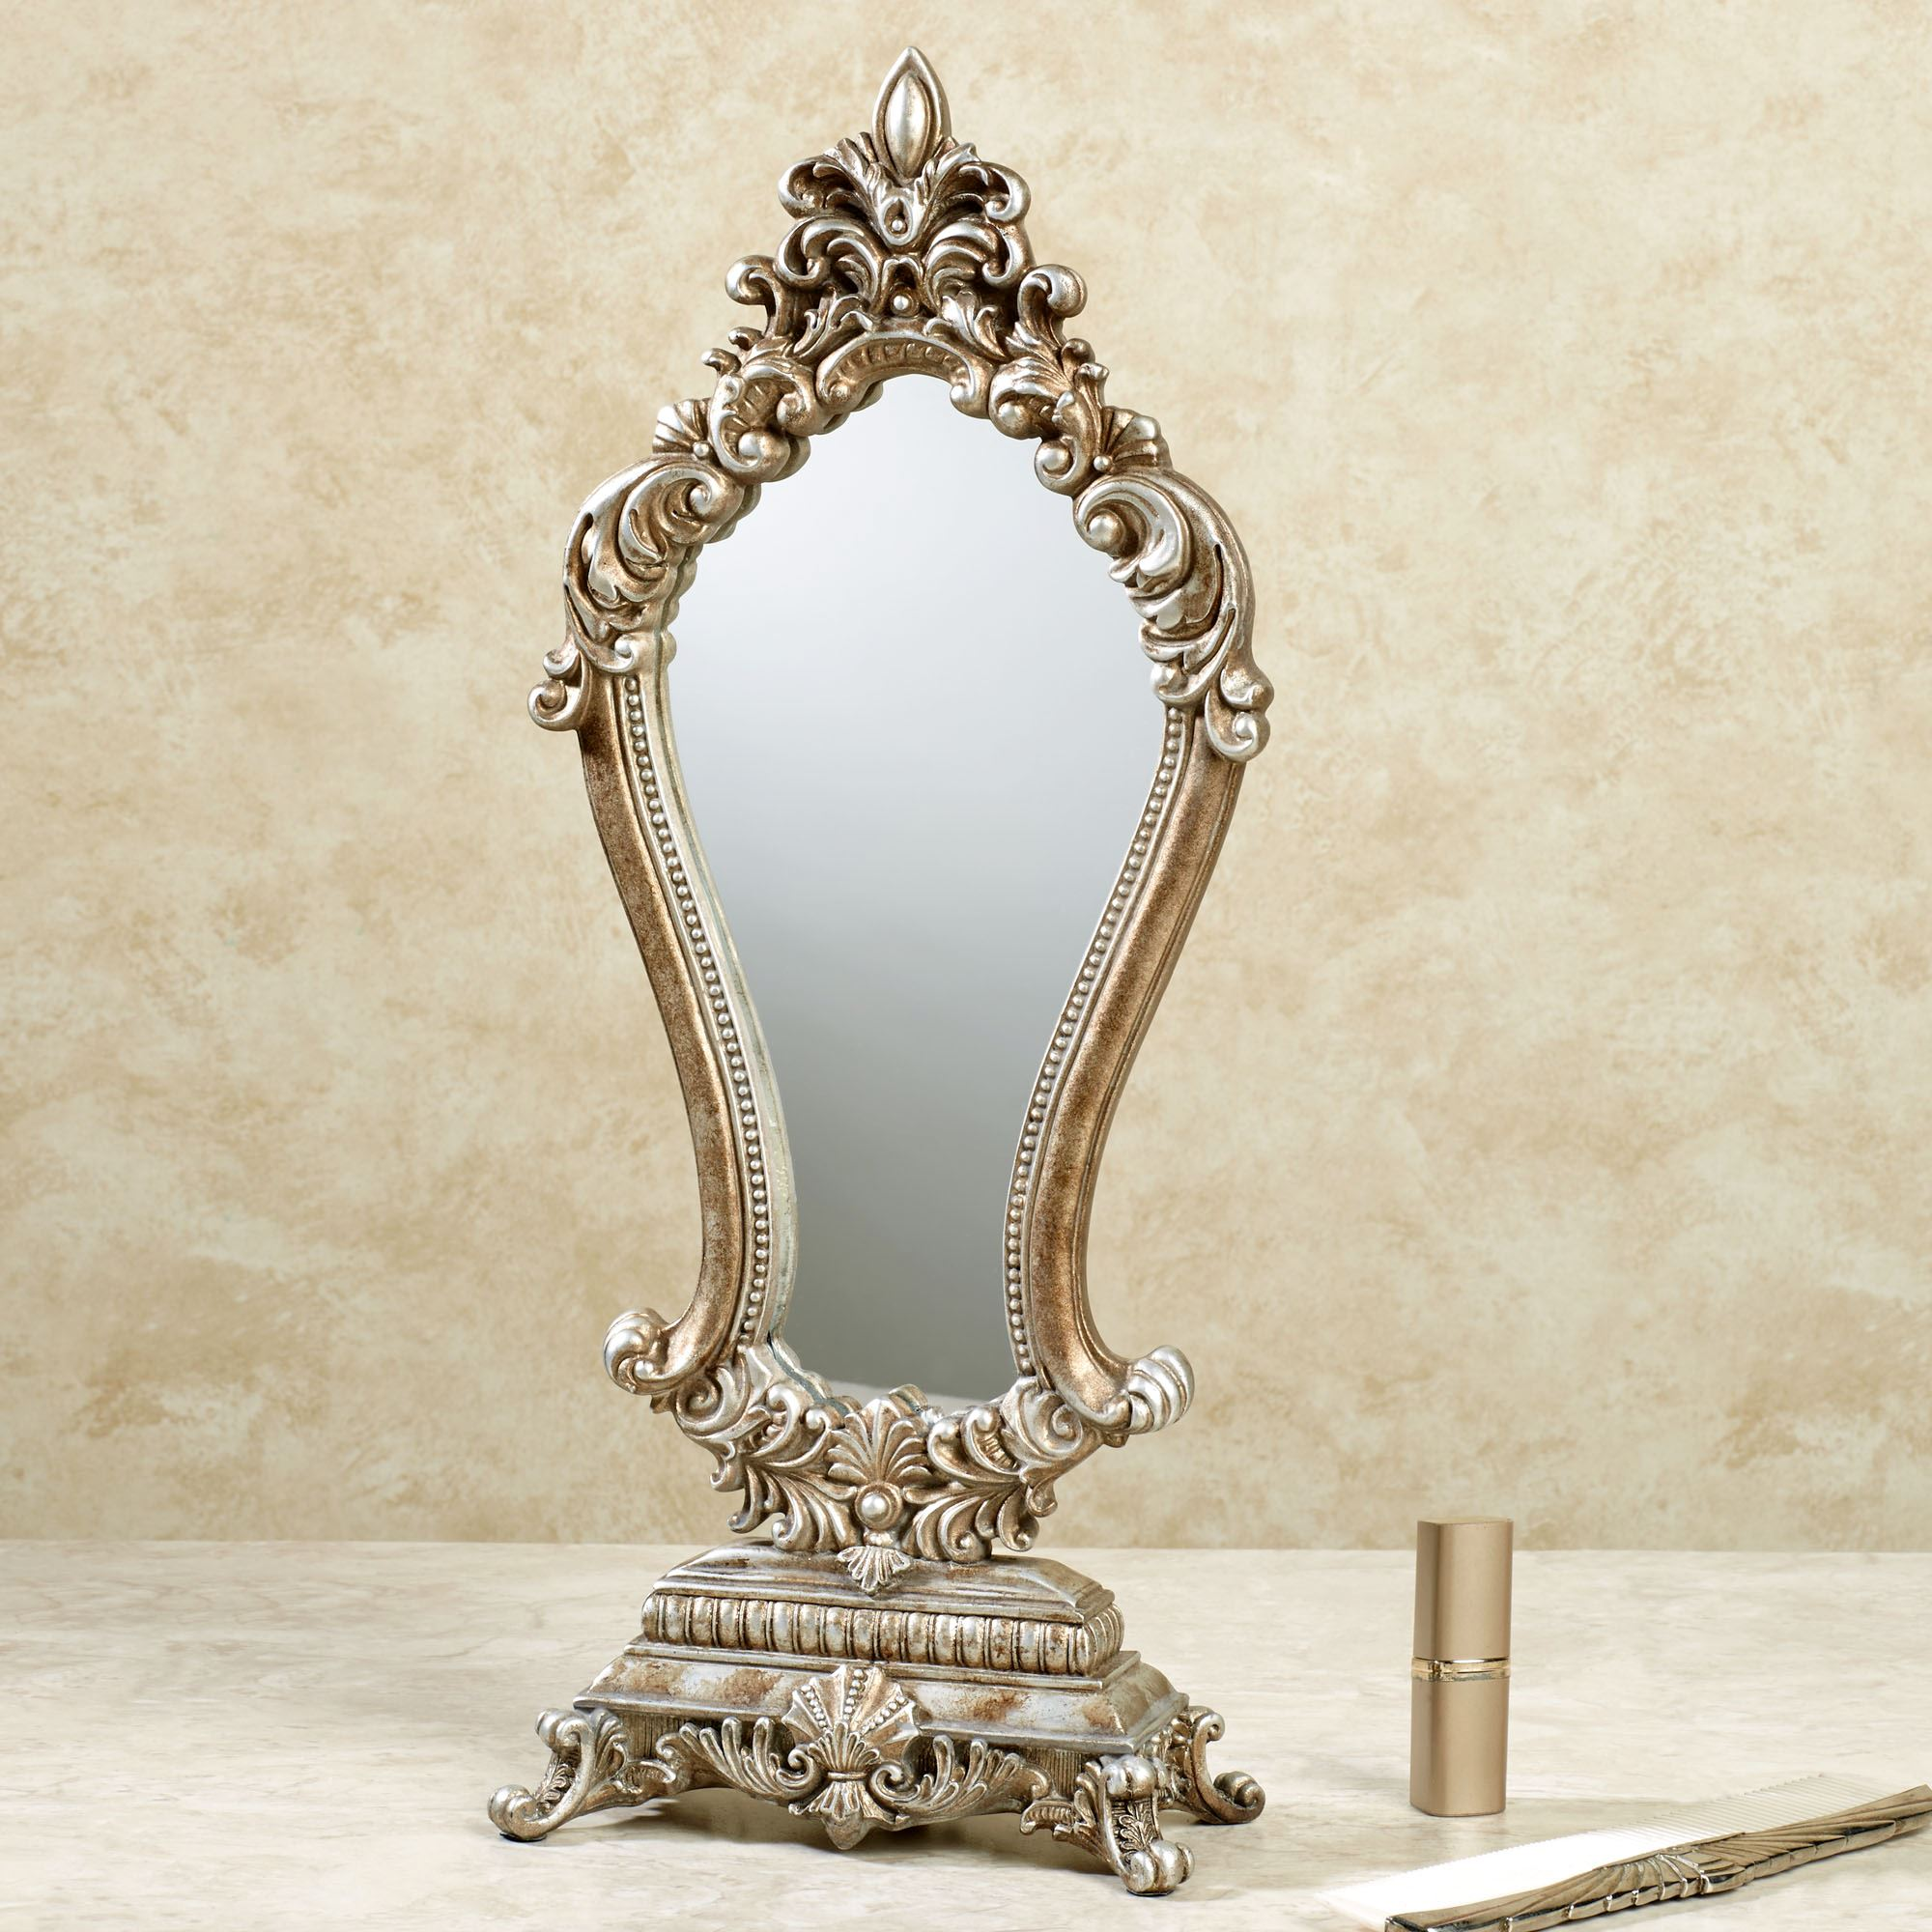 Old fashioned vanity mirror 42